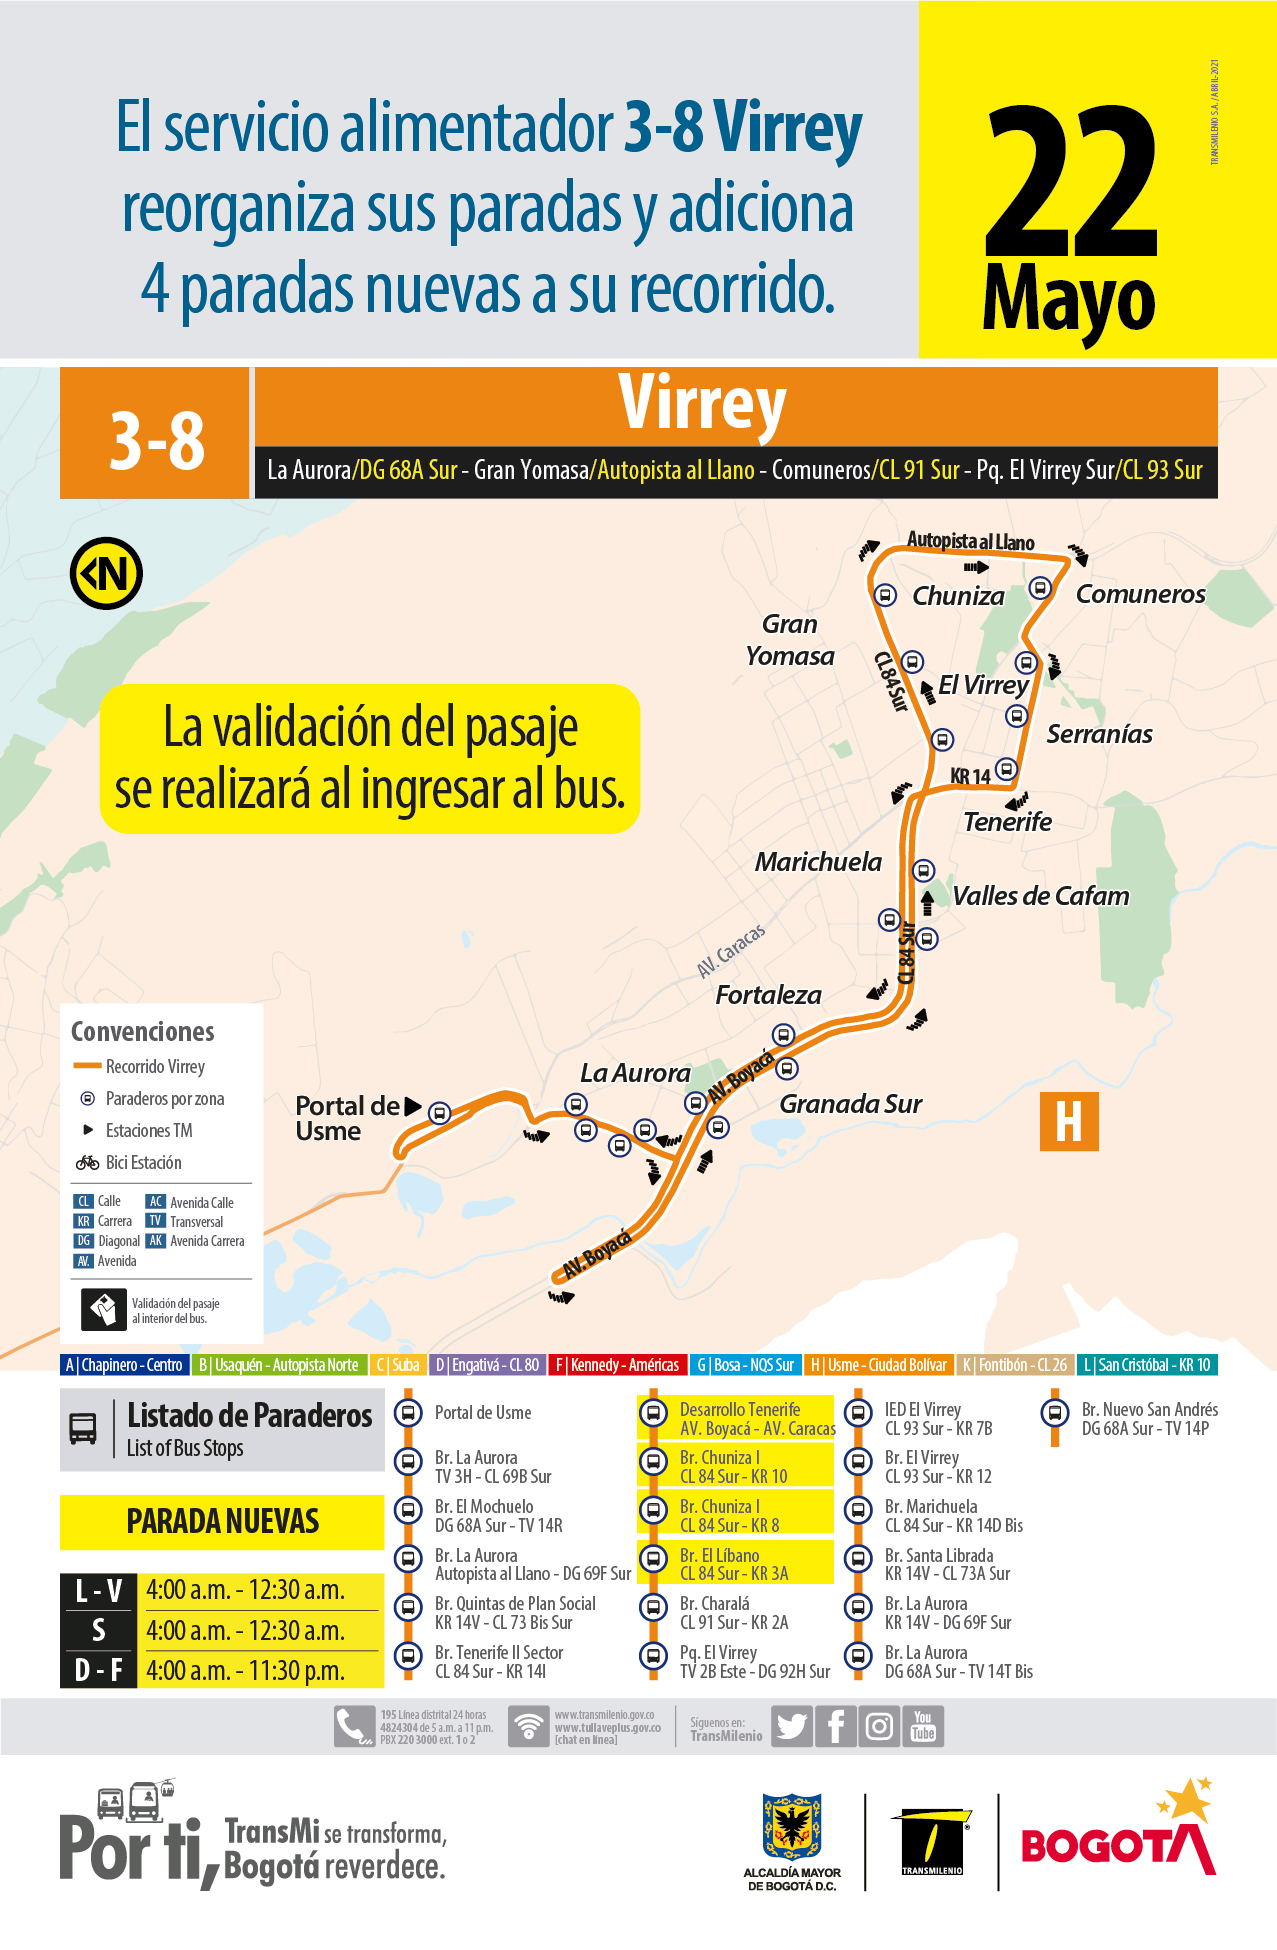 3-8 Virrey